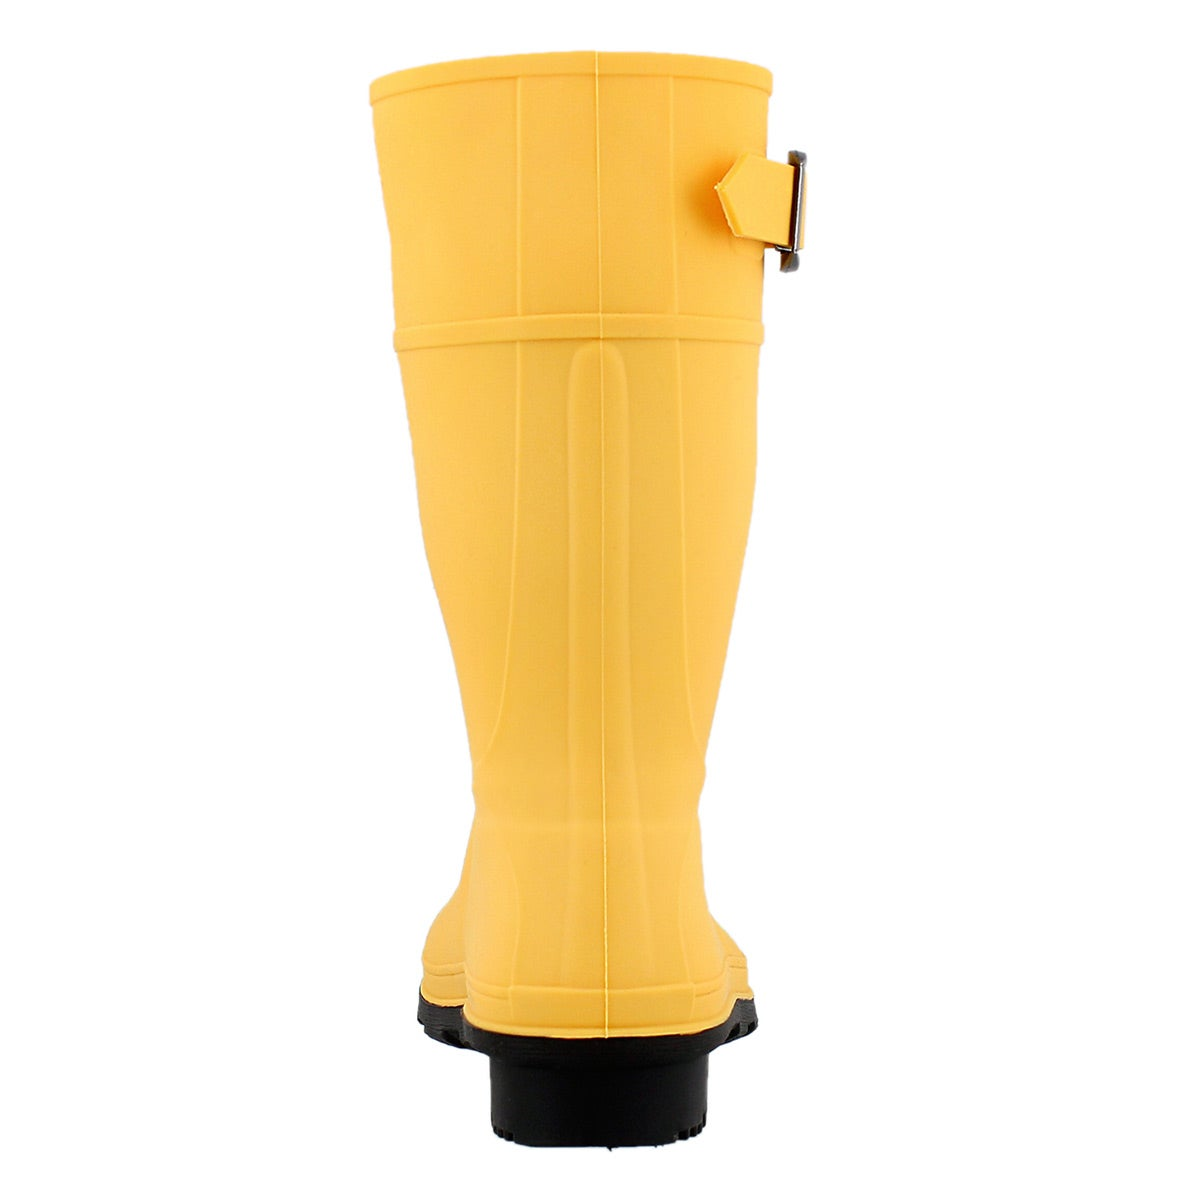 Grls Raindrops amber wtpf rain boot